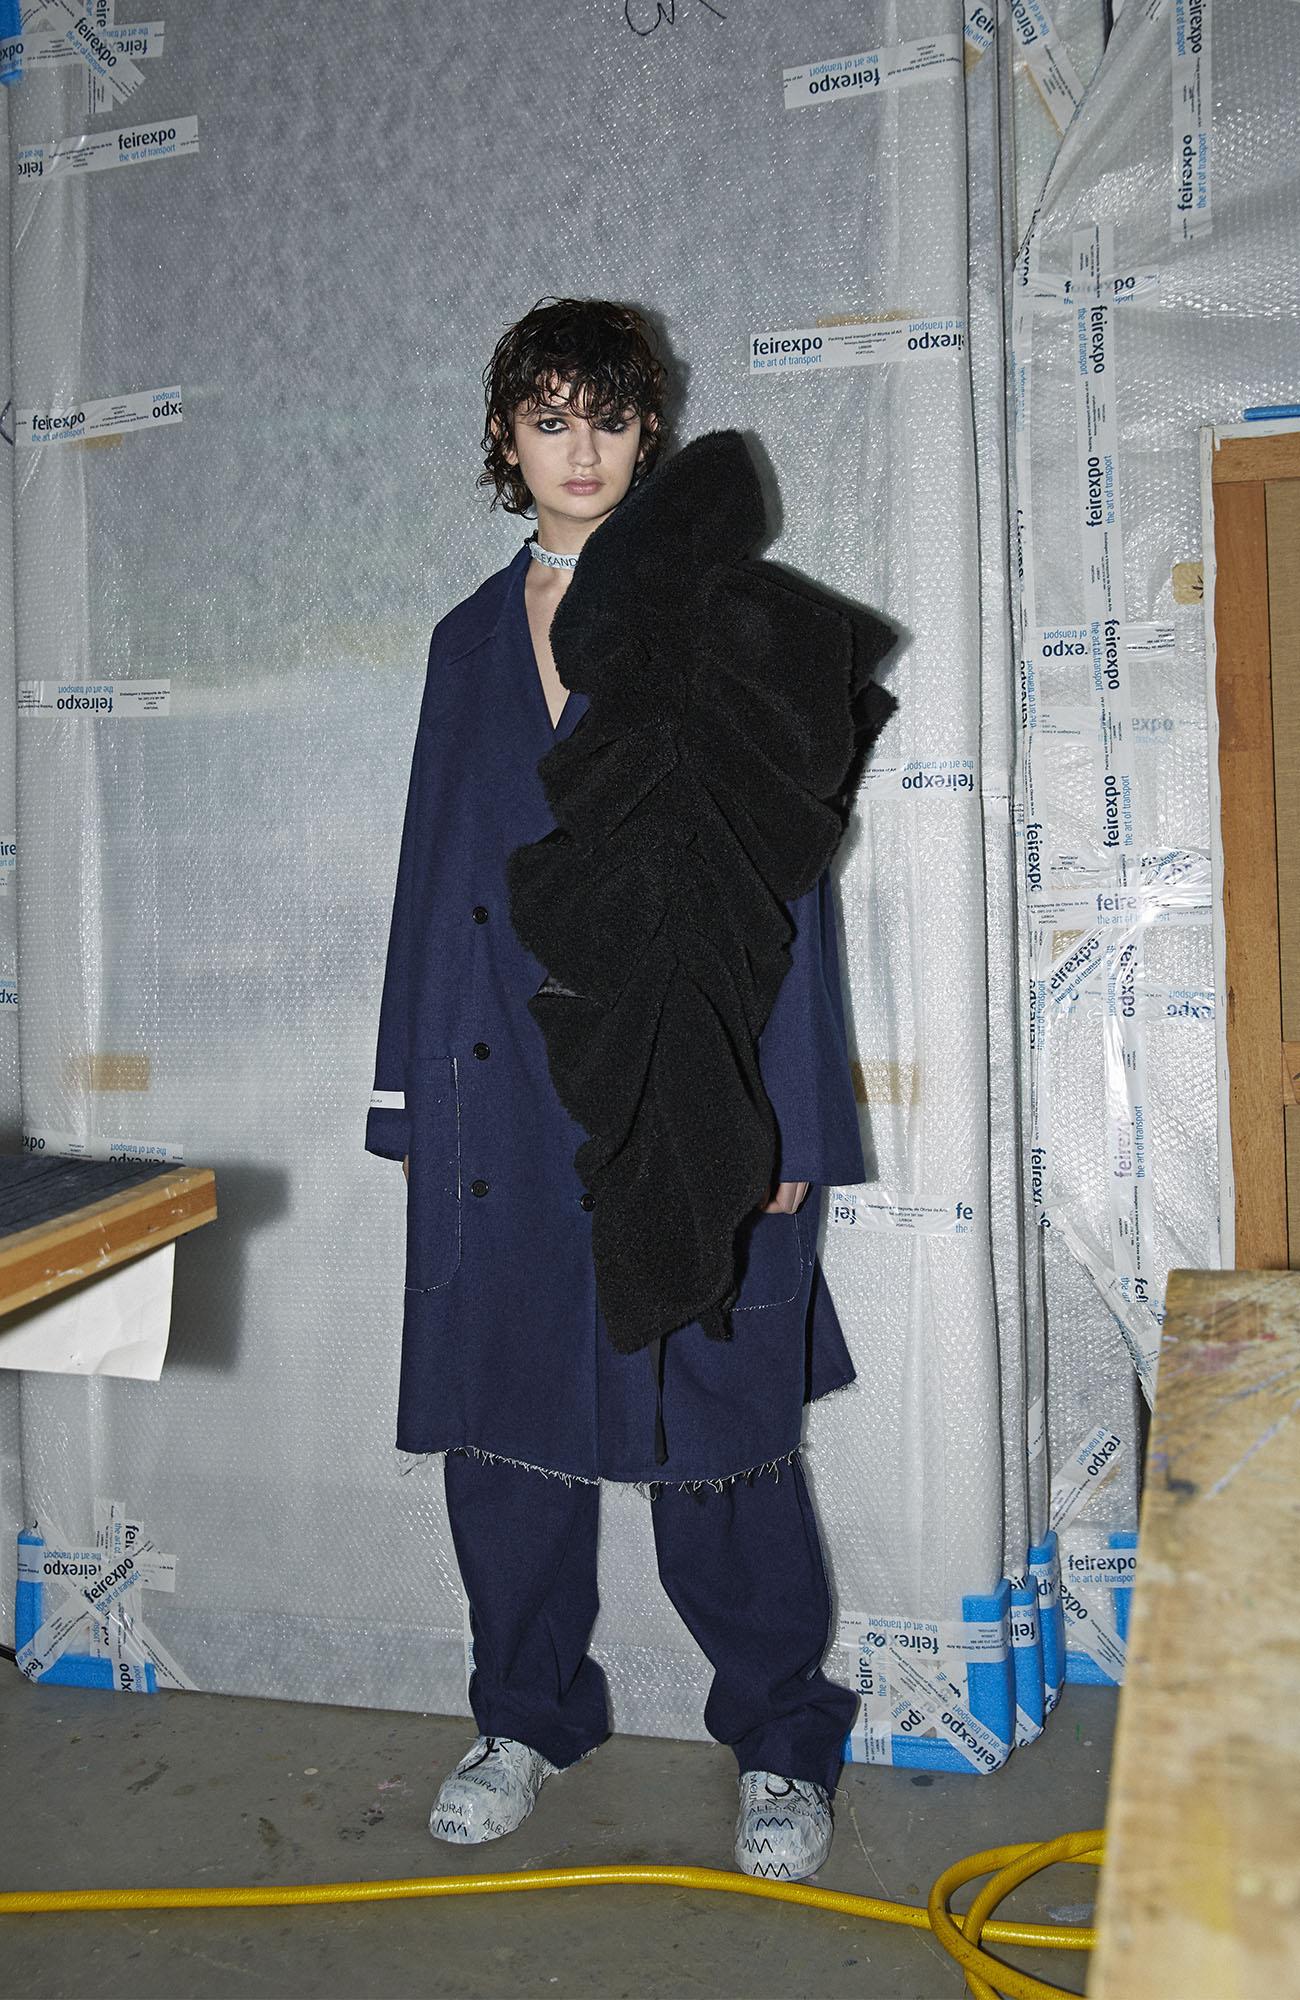 Alexandra Moura FW 21/22 - Milano Fashion Week 3